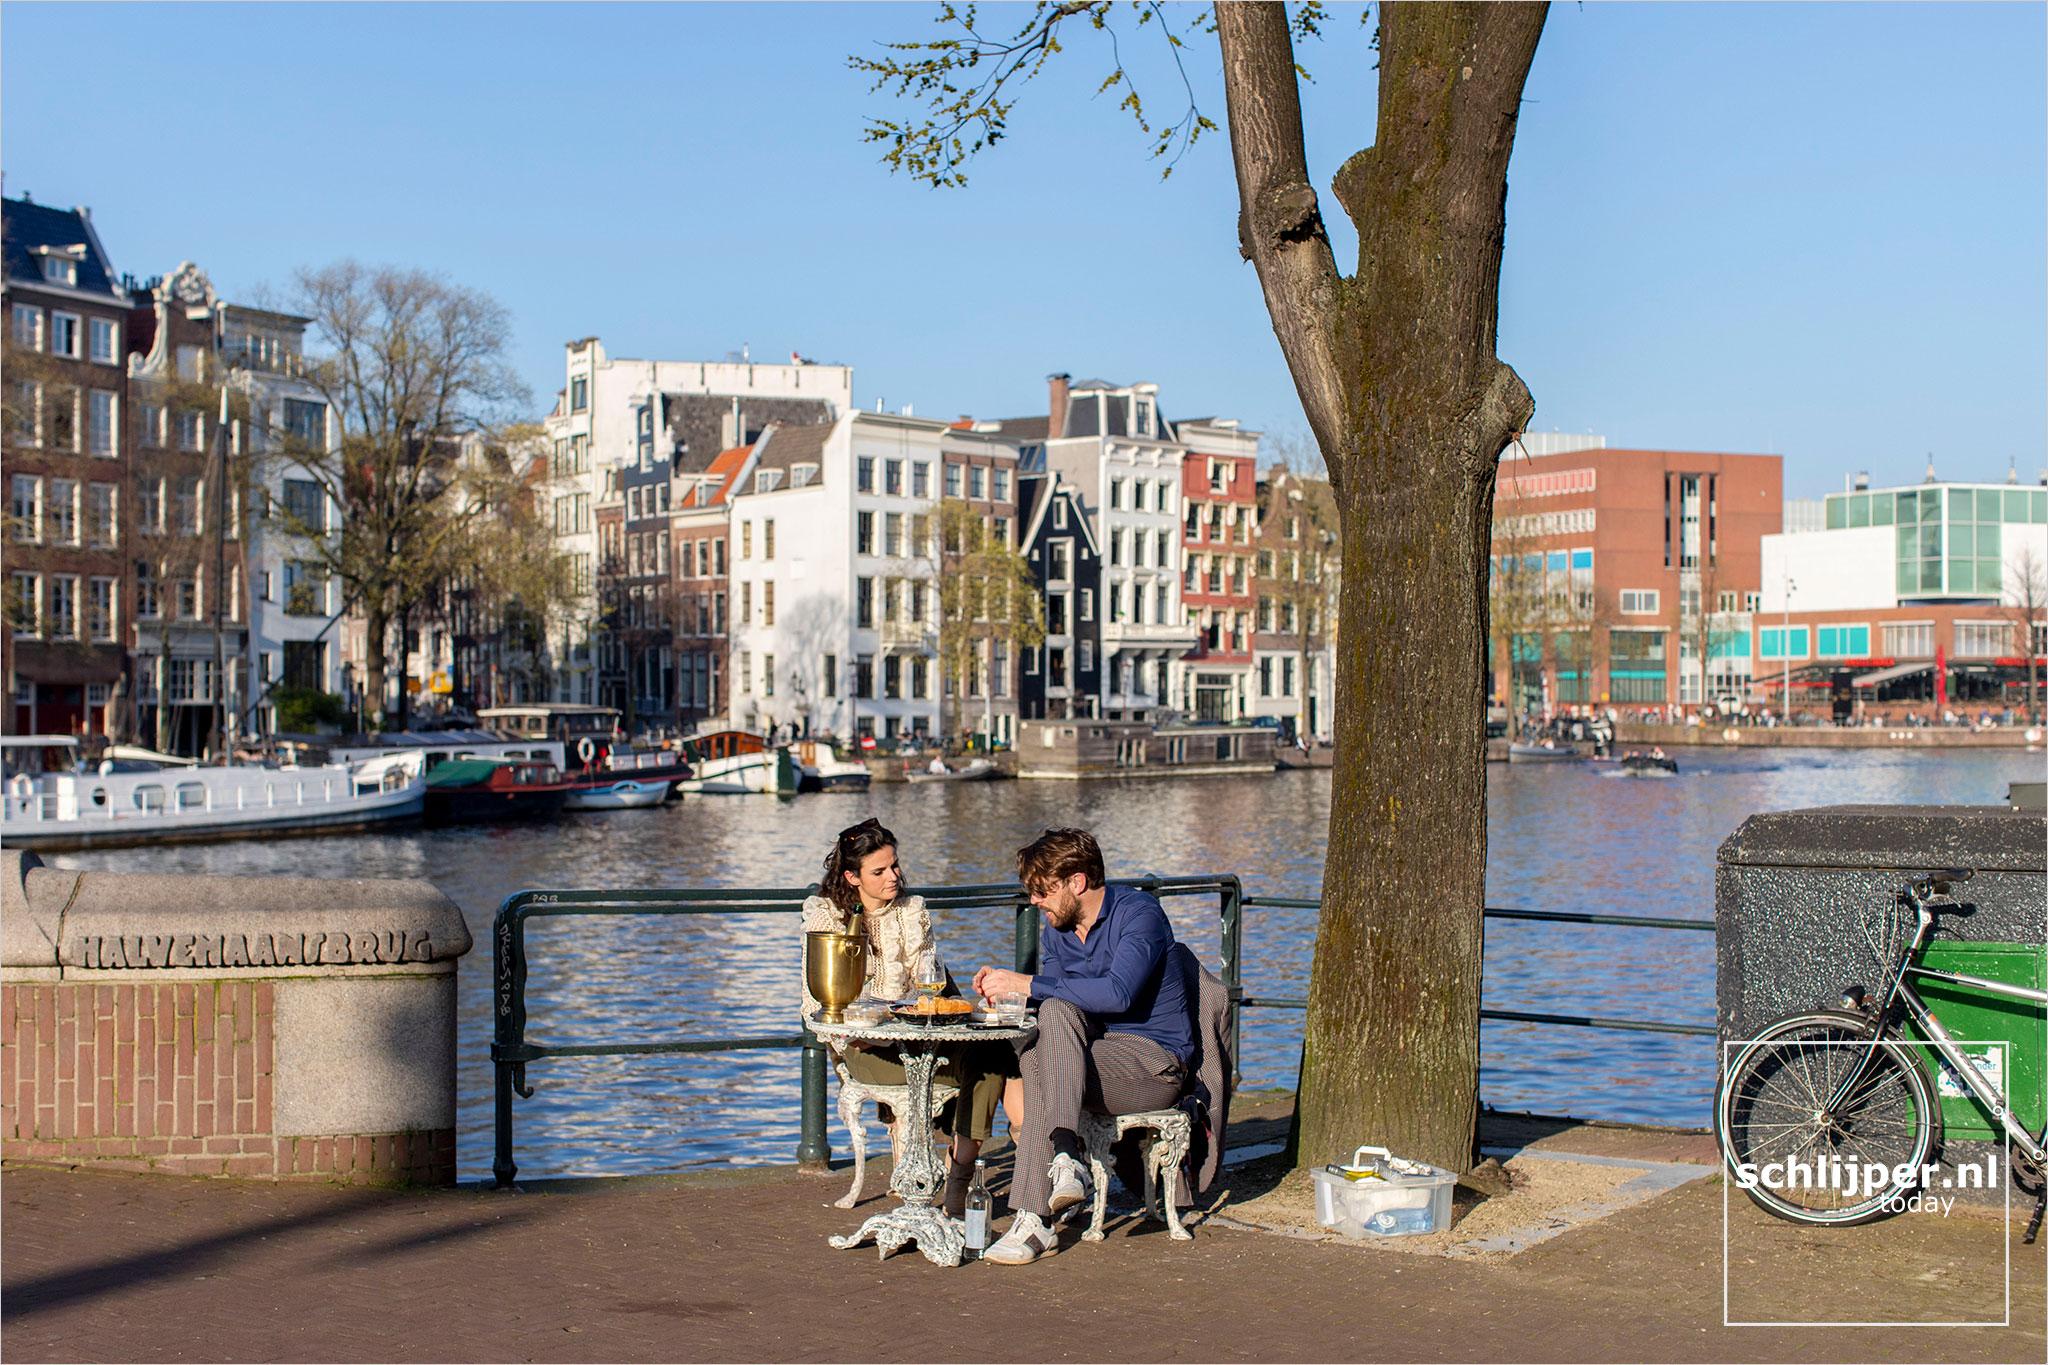 The Netherlands, Amsterdam, 30 maart 2021